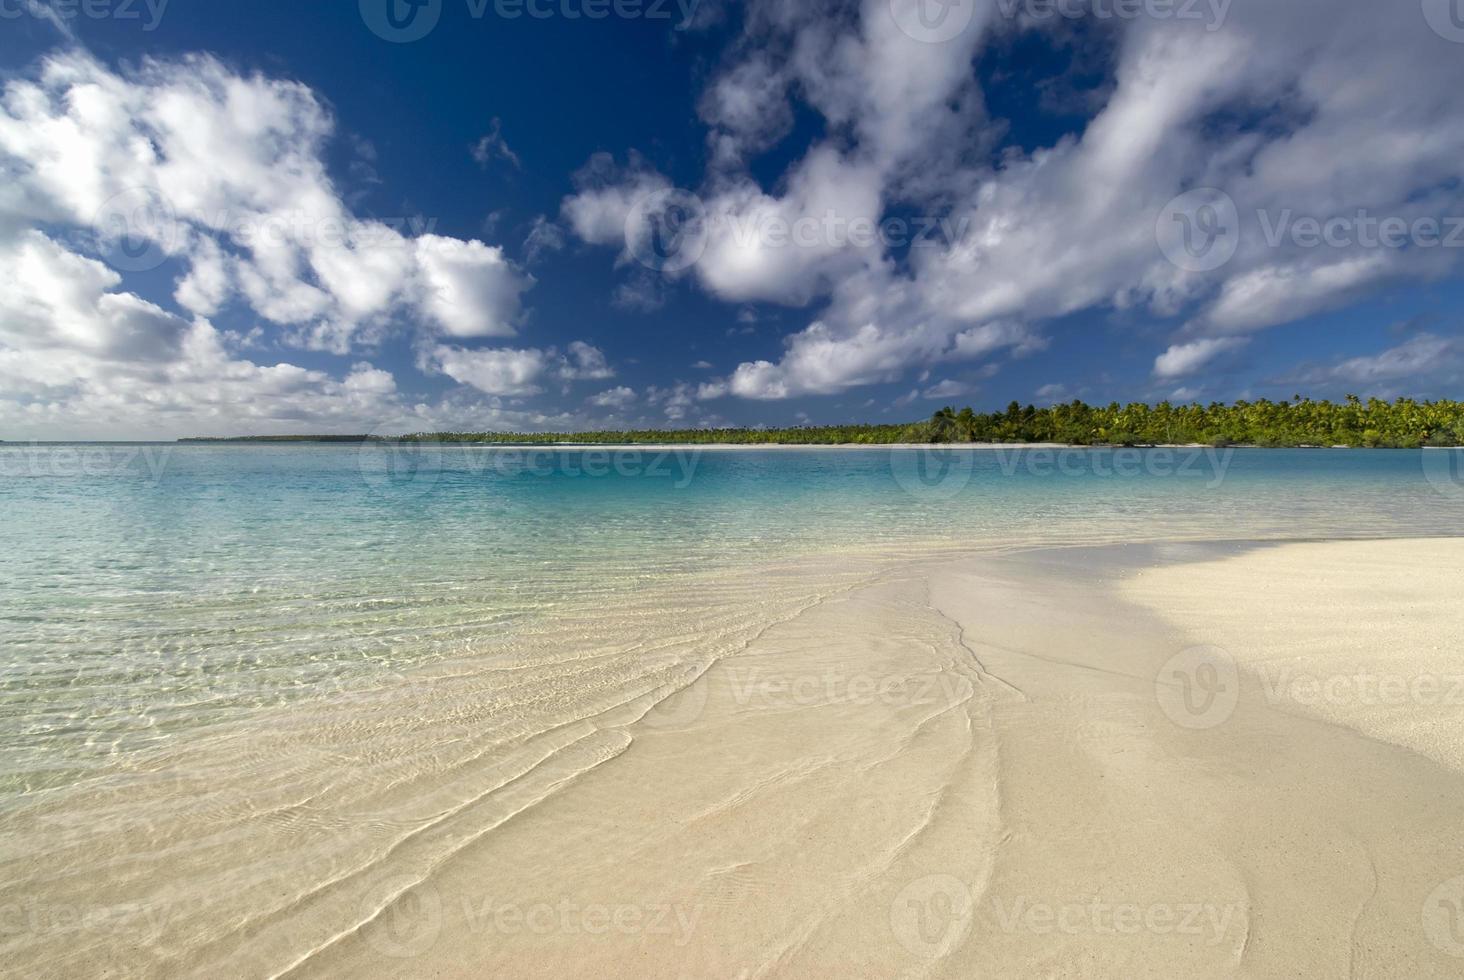 Sandy, shallow, tropical beach. One Foot Island, Aitutaki photo